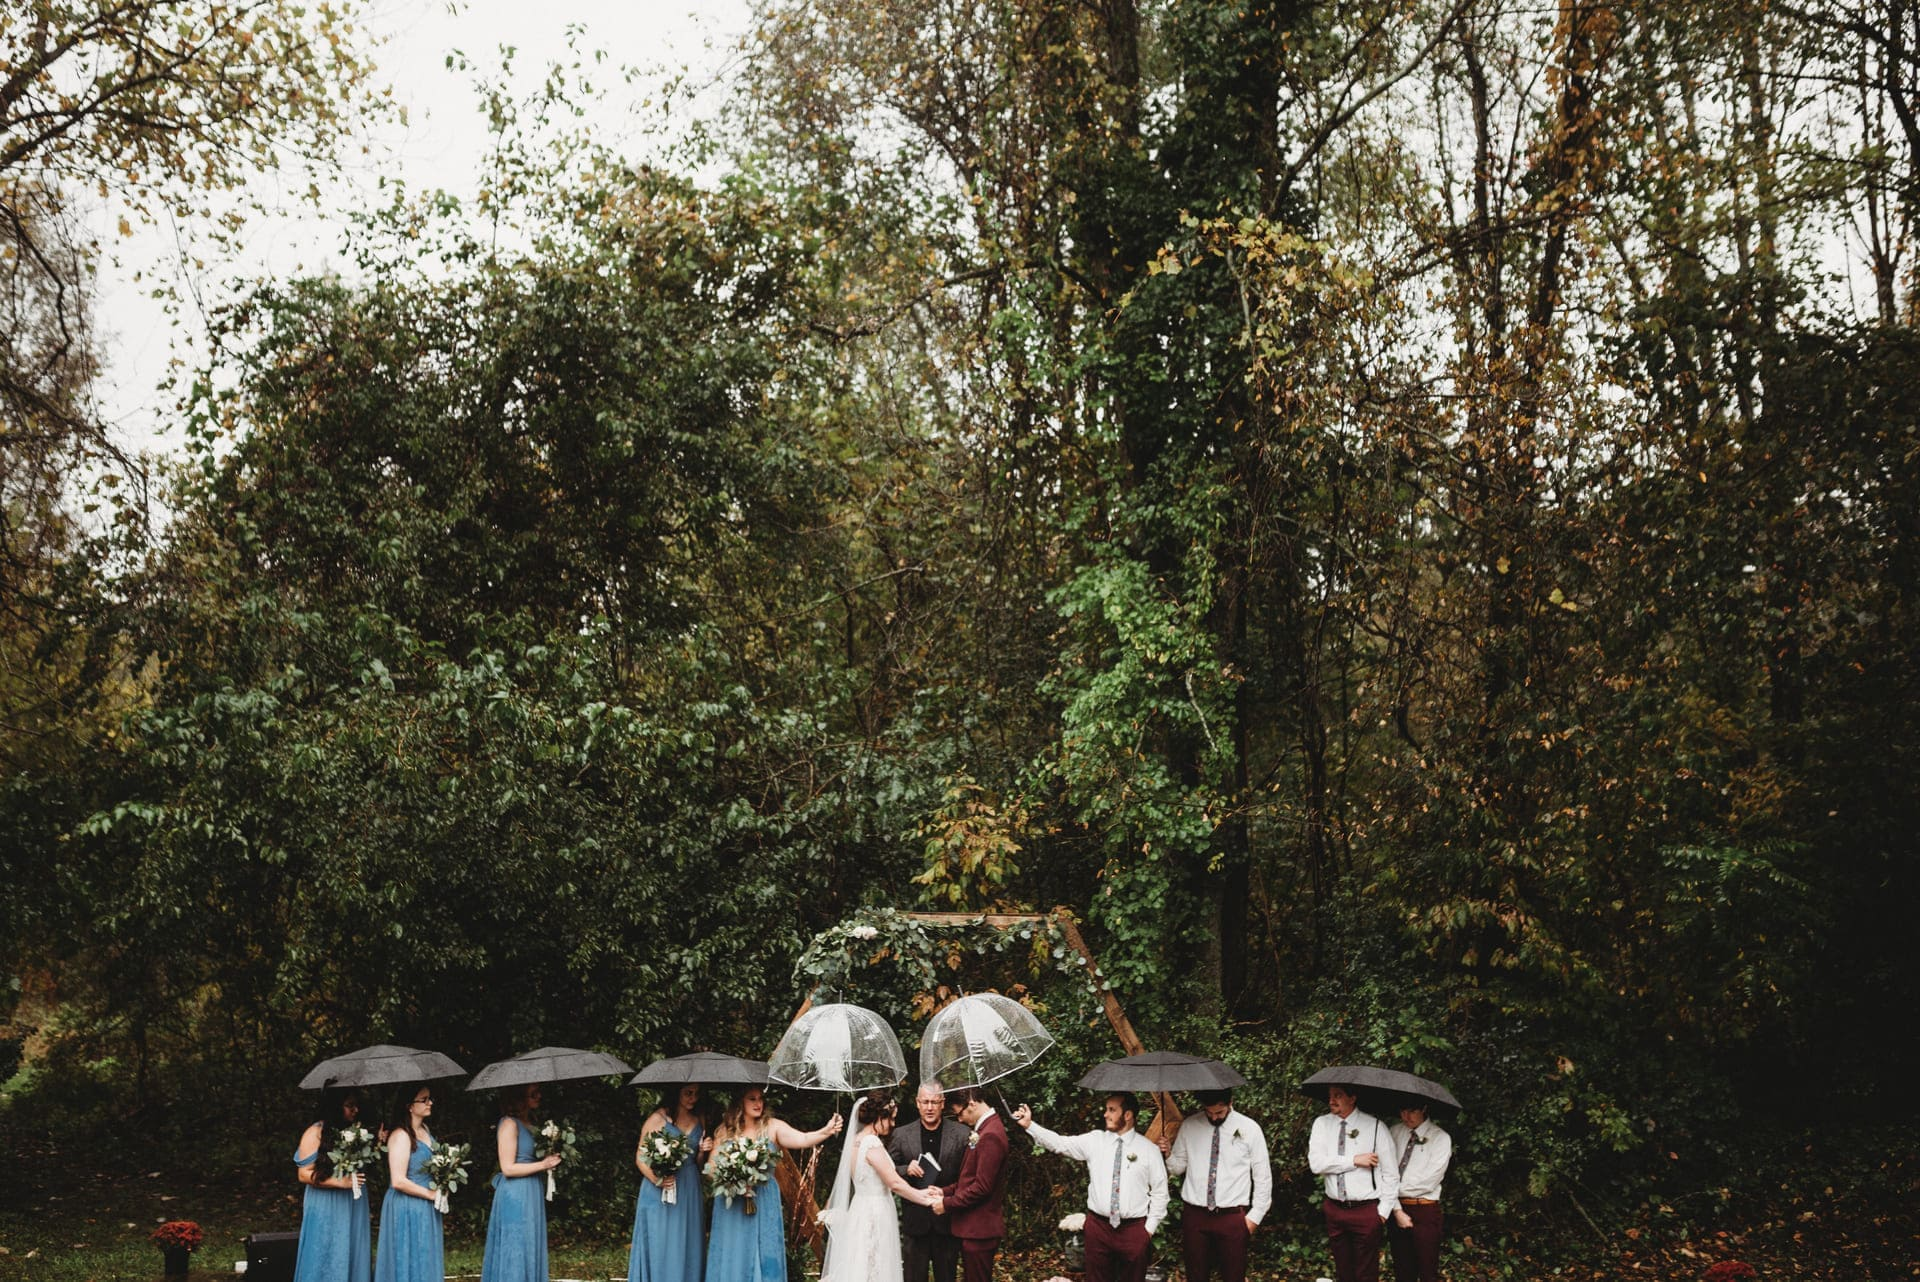 Umbrellas Richland Michigan Wedding Photography